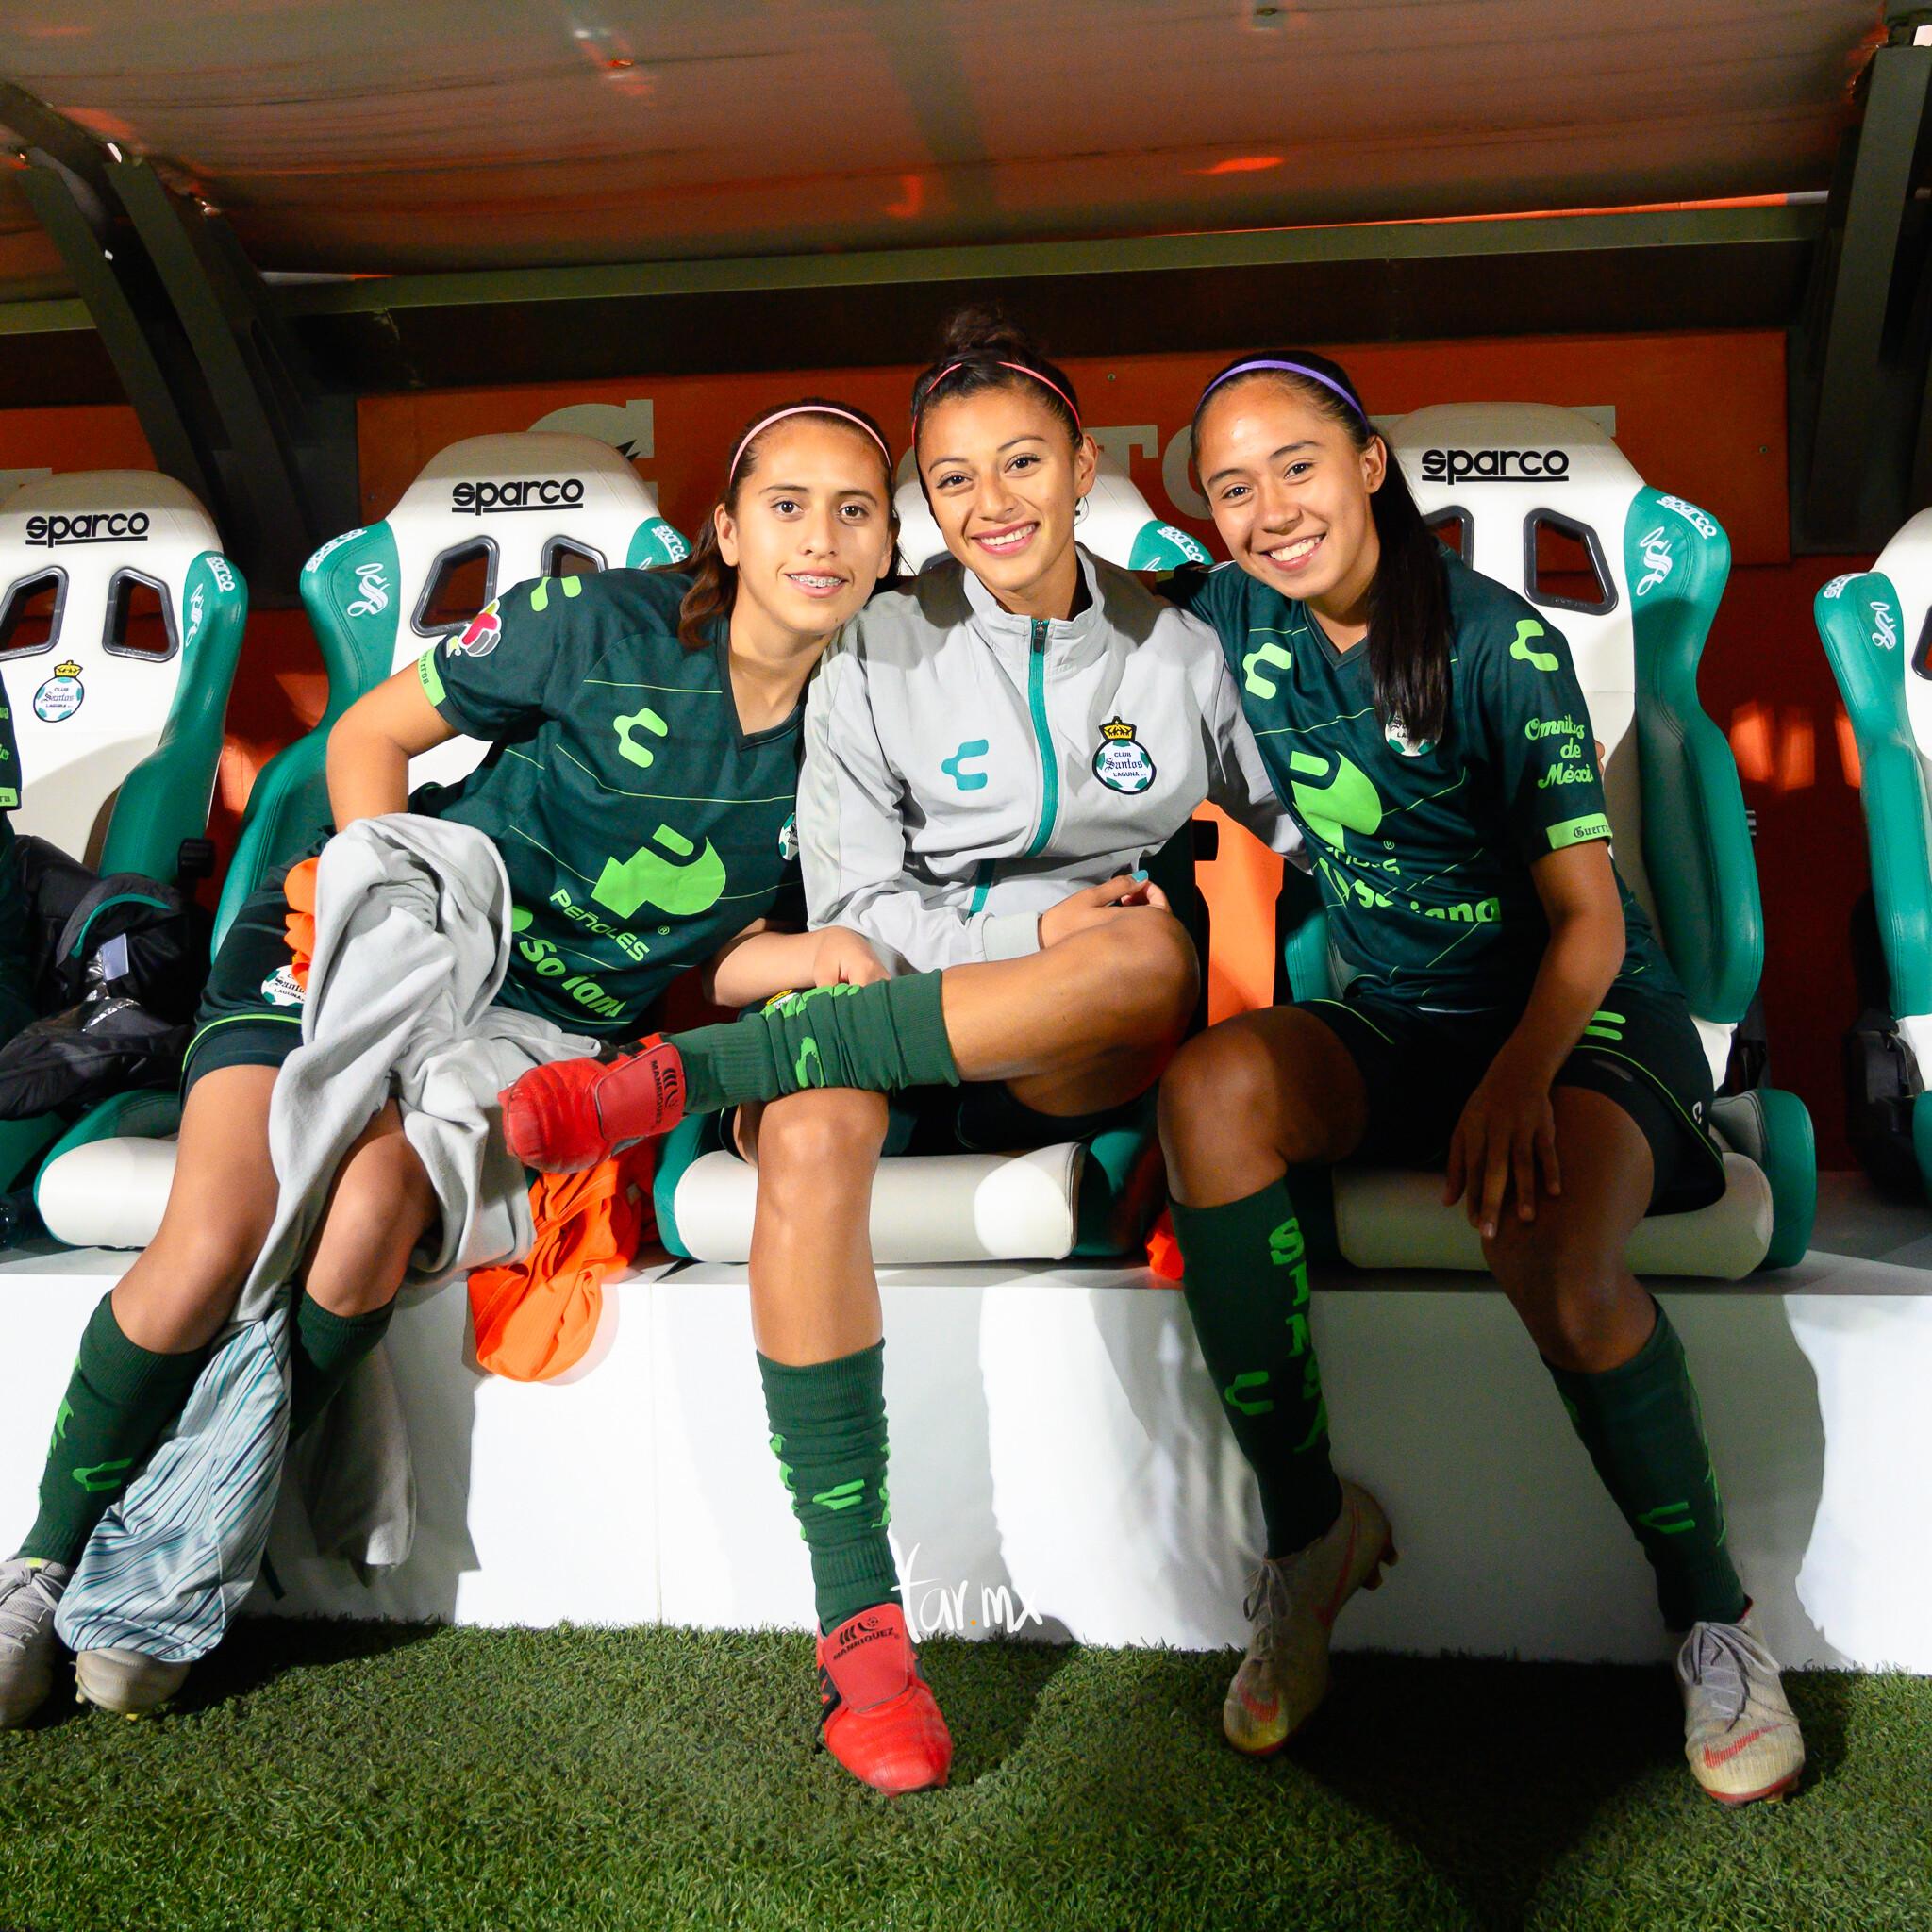 Brenda Guevara, Karyme Martínez, Olga Trasviña